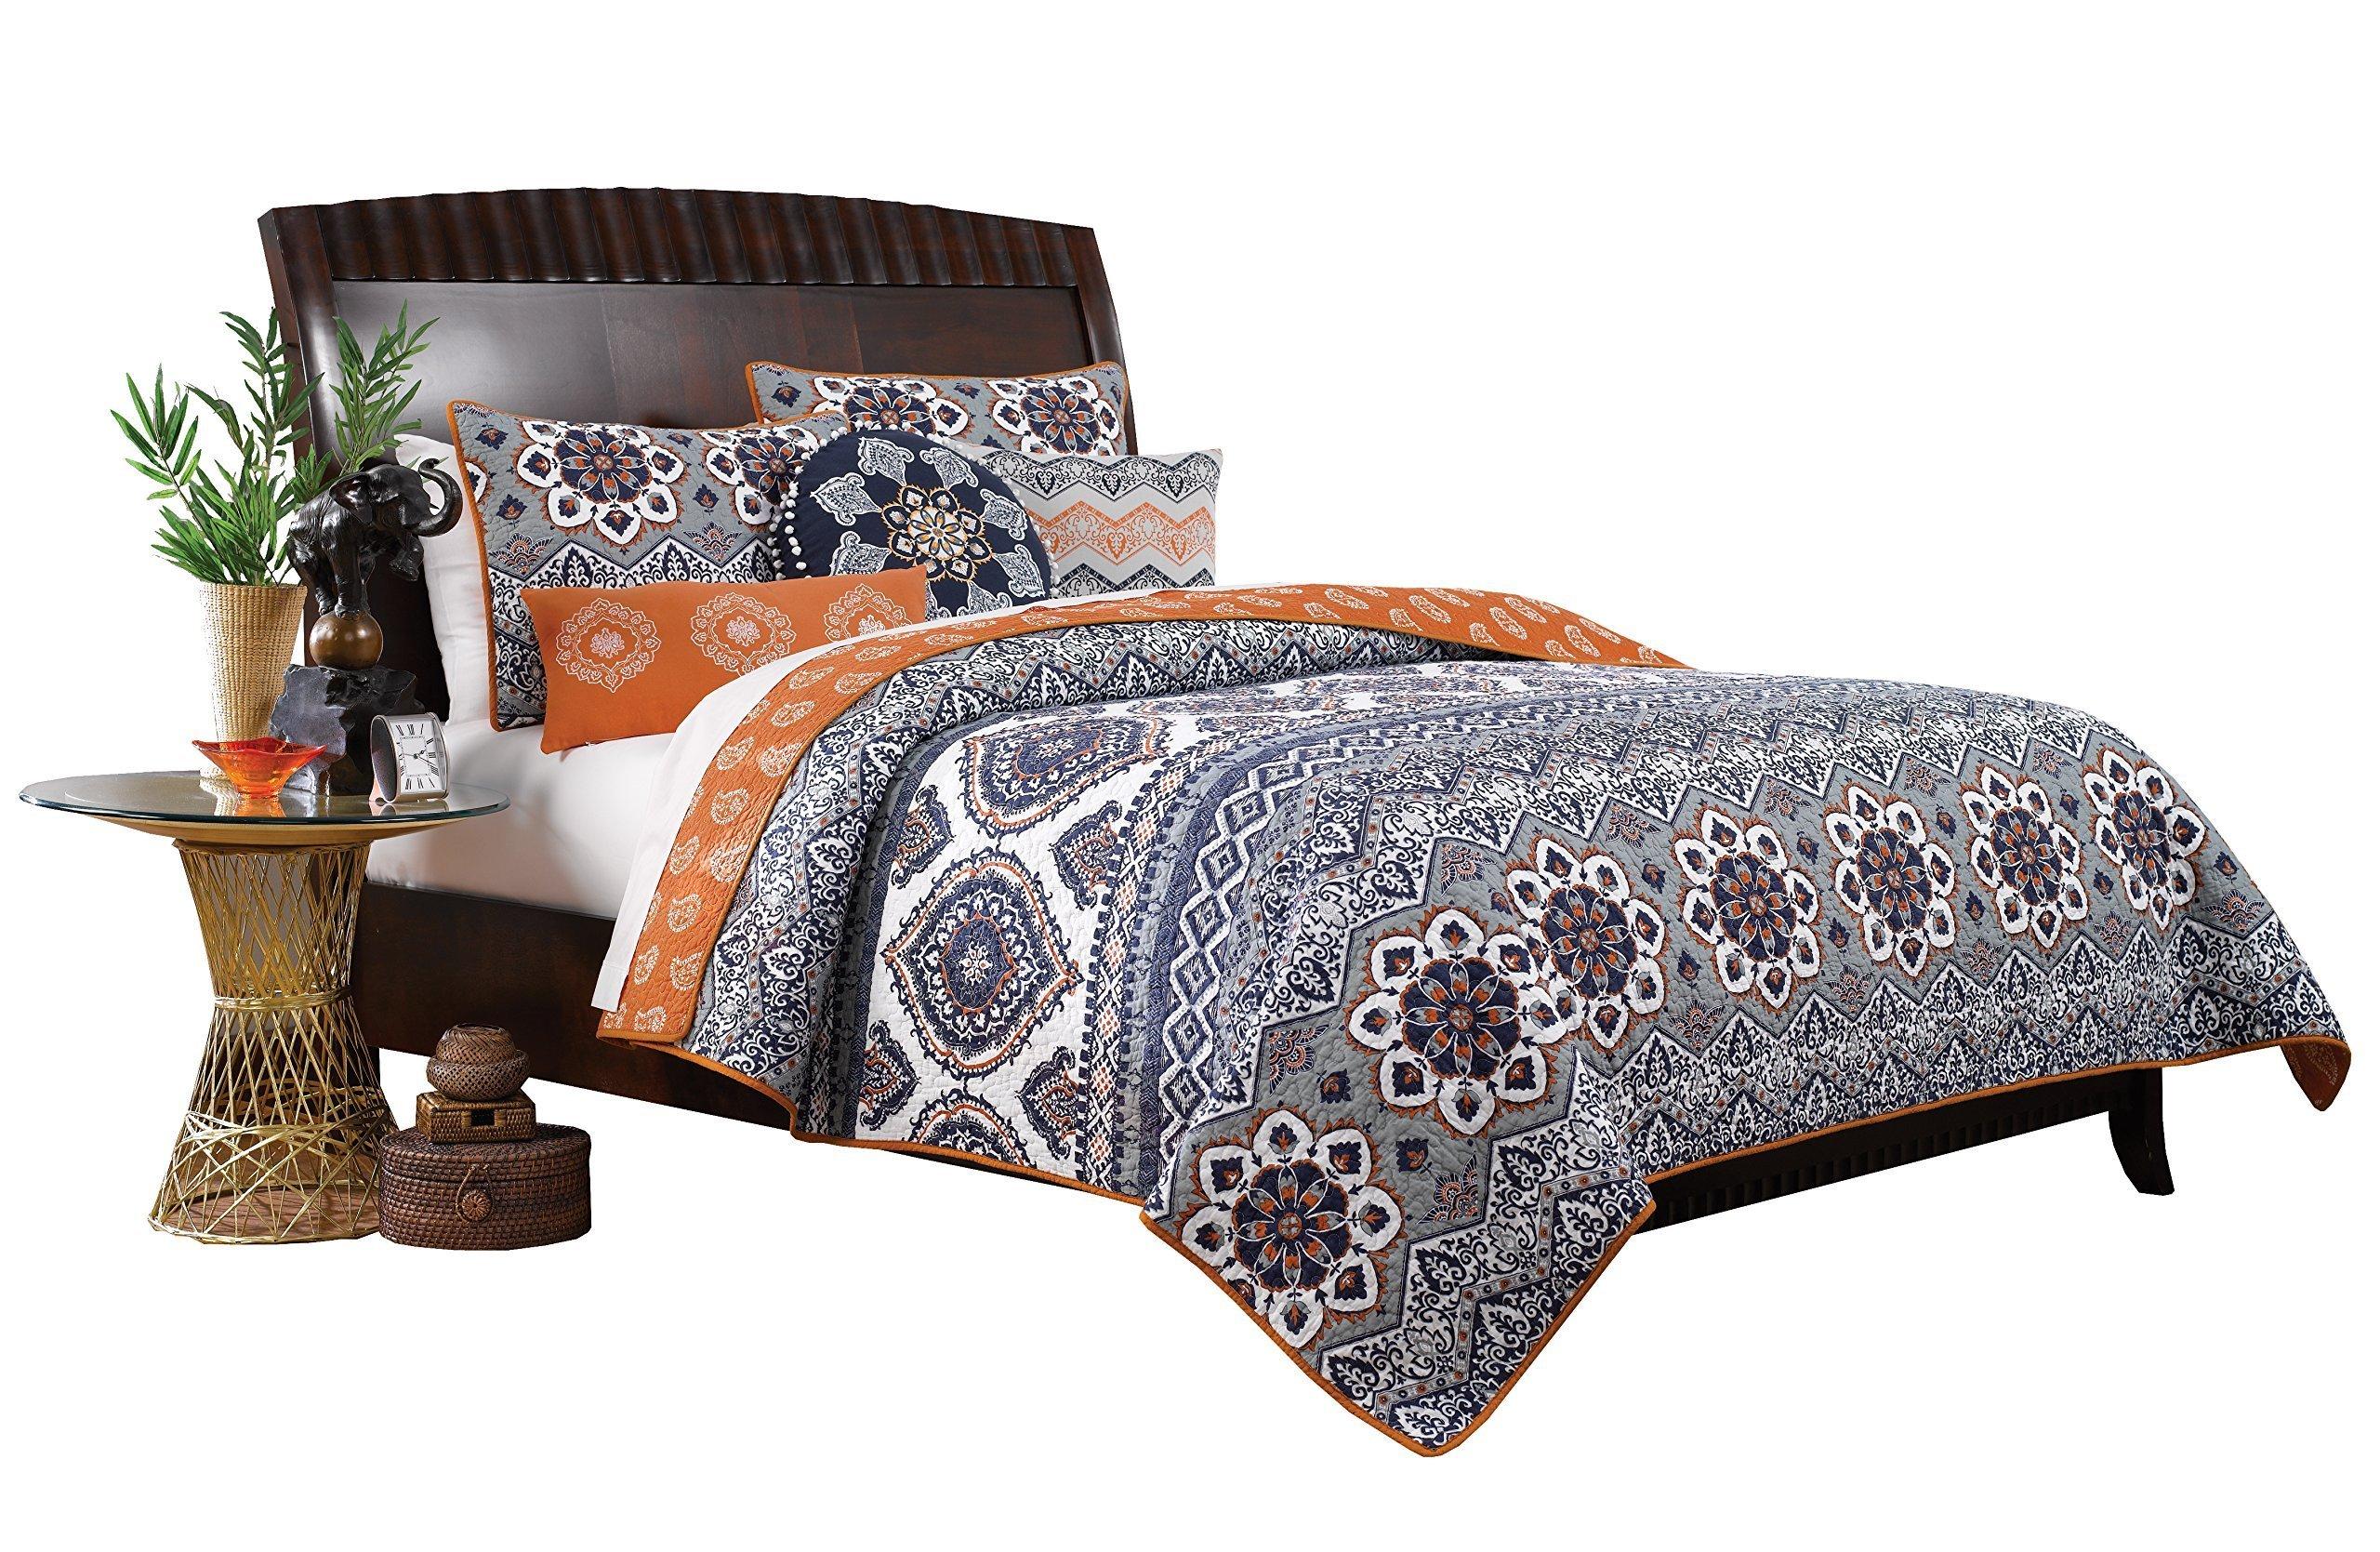 Greenland Home 3 Piece Medina Quilt Set, King, Saffron